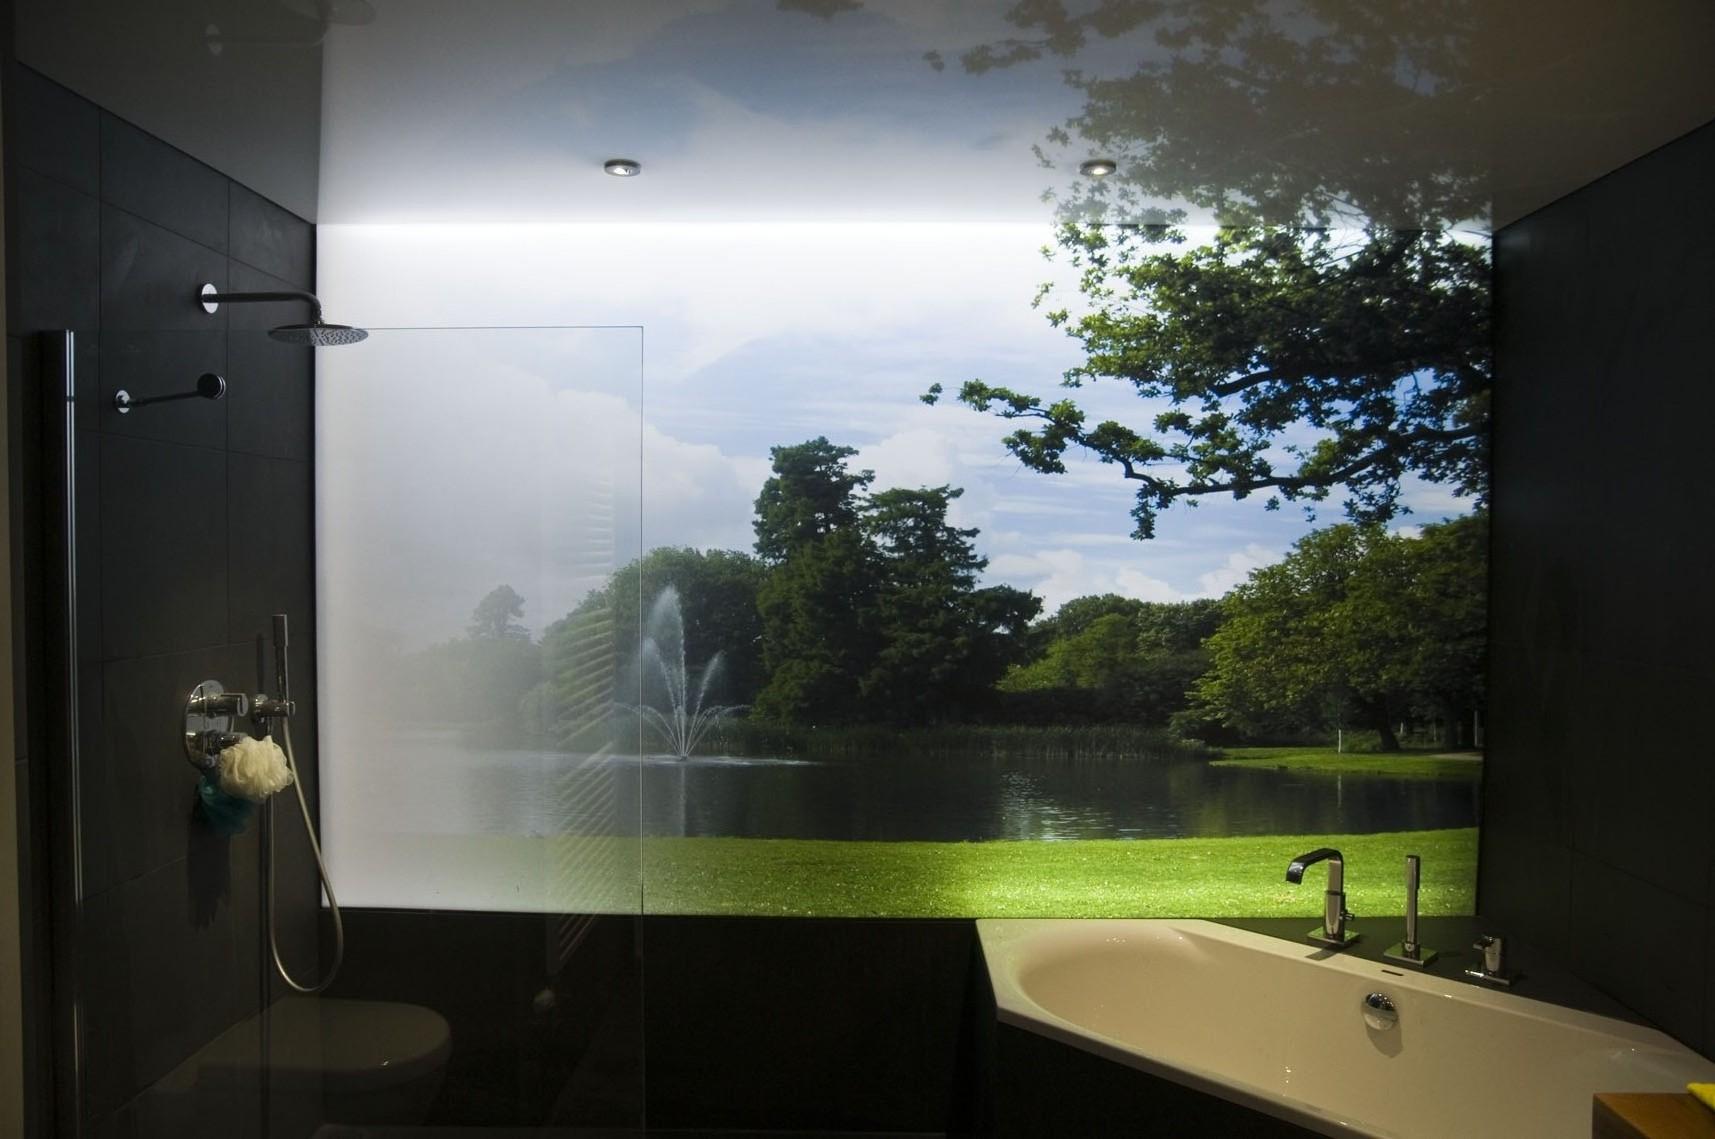 peinture plafond salle de bain humide trace humidit mur with peinture plafond salle de bain. Black Bedroom Furniture Sets. Home Design Ideas